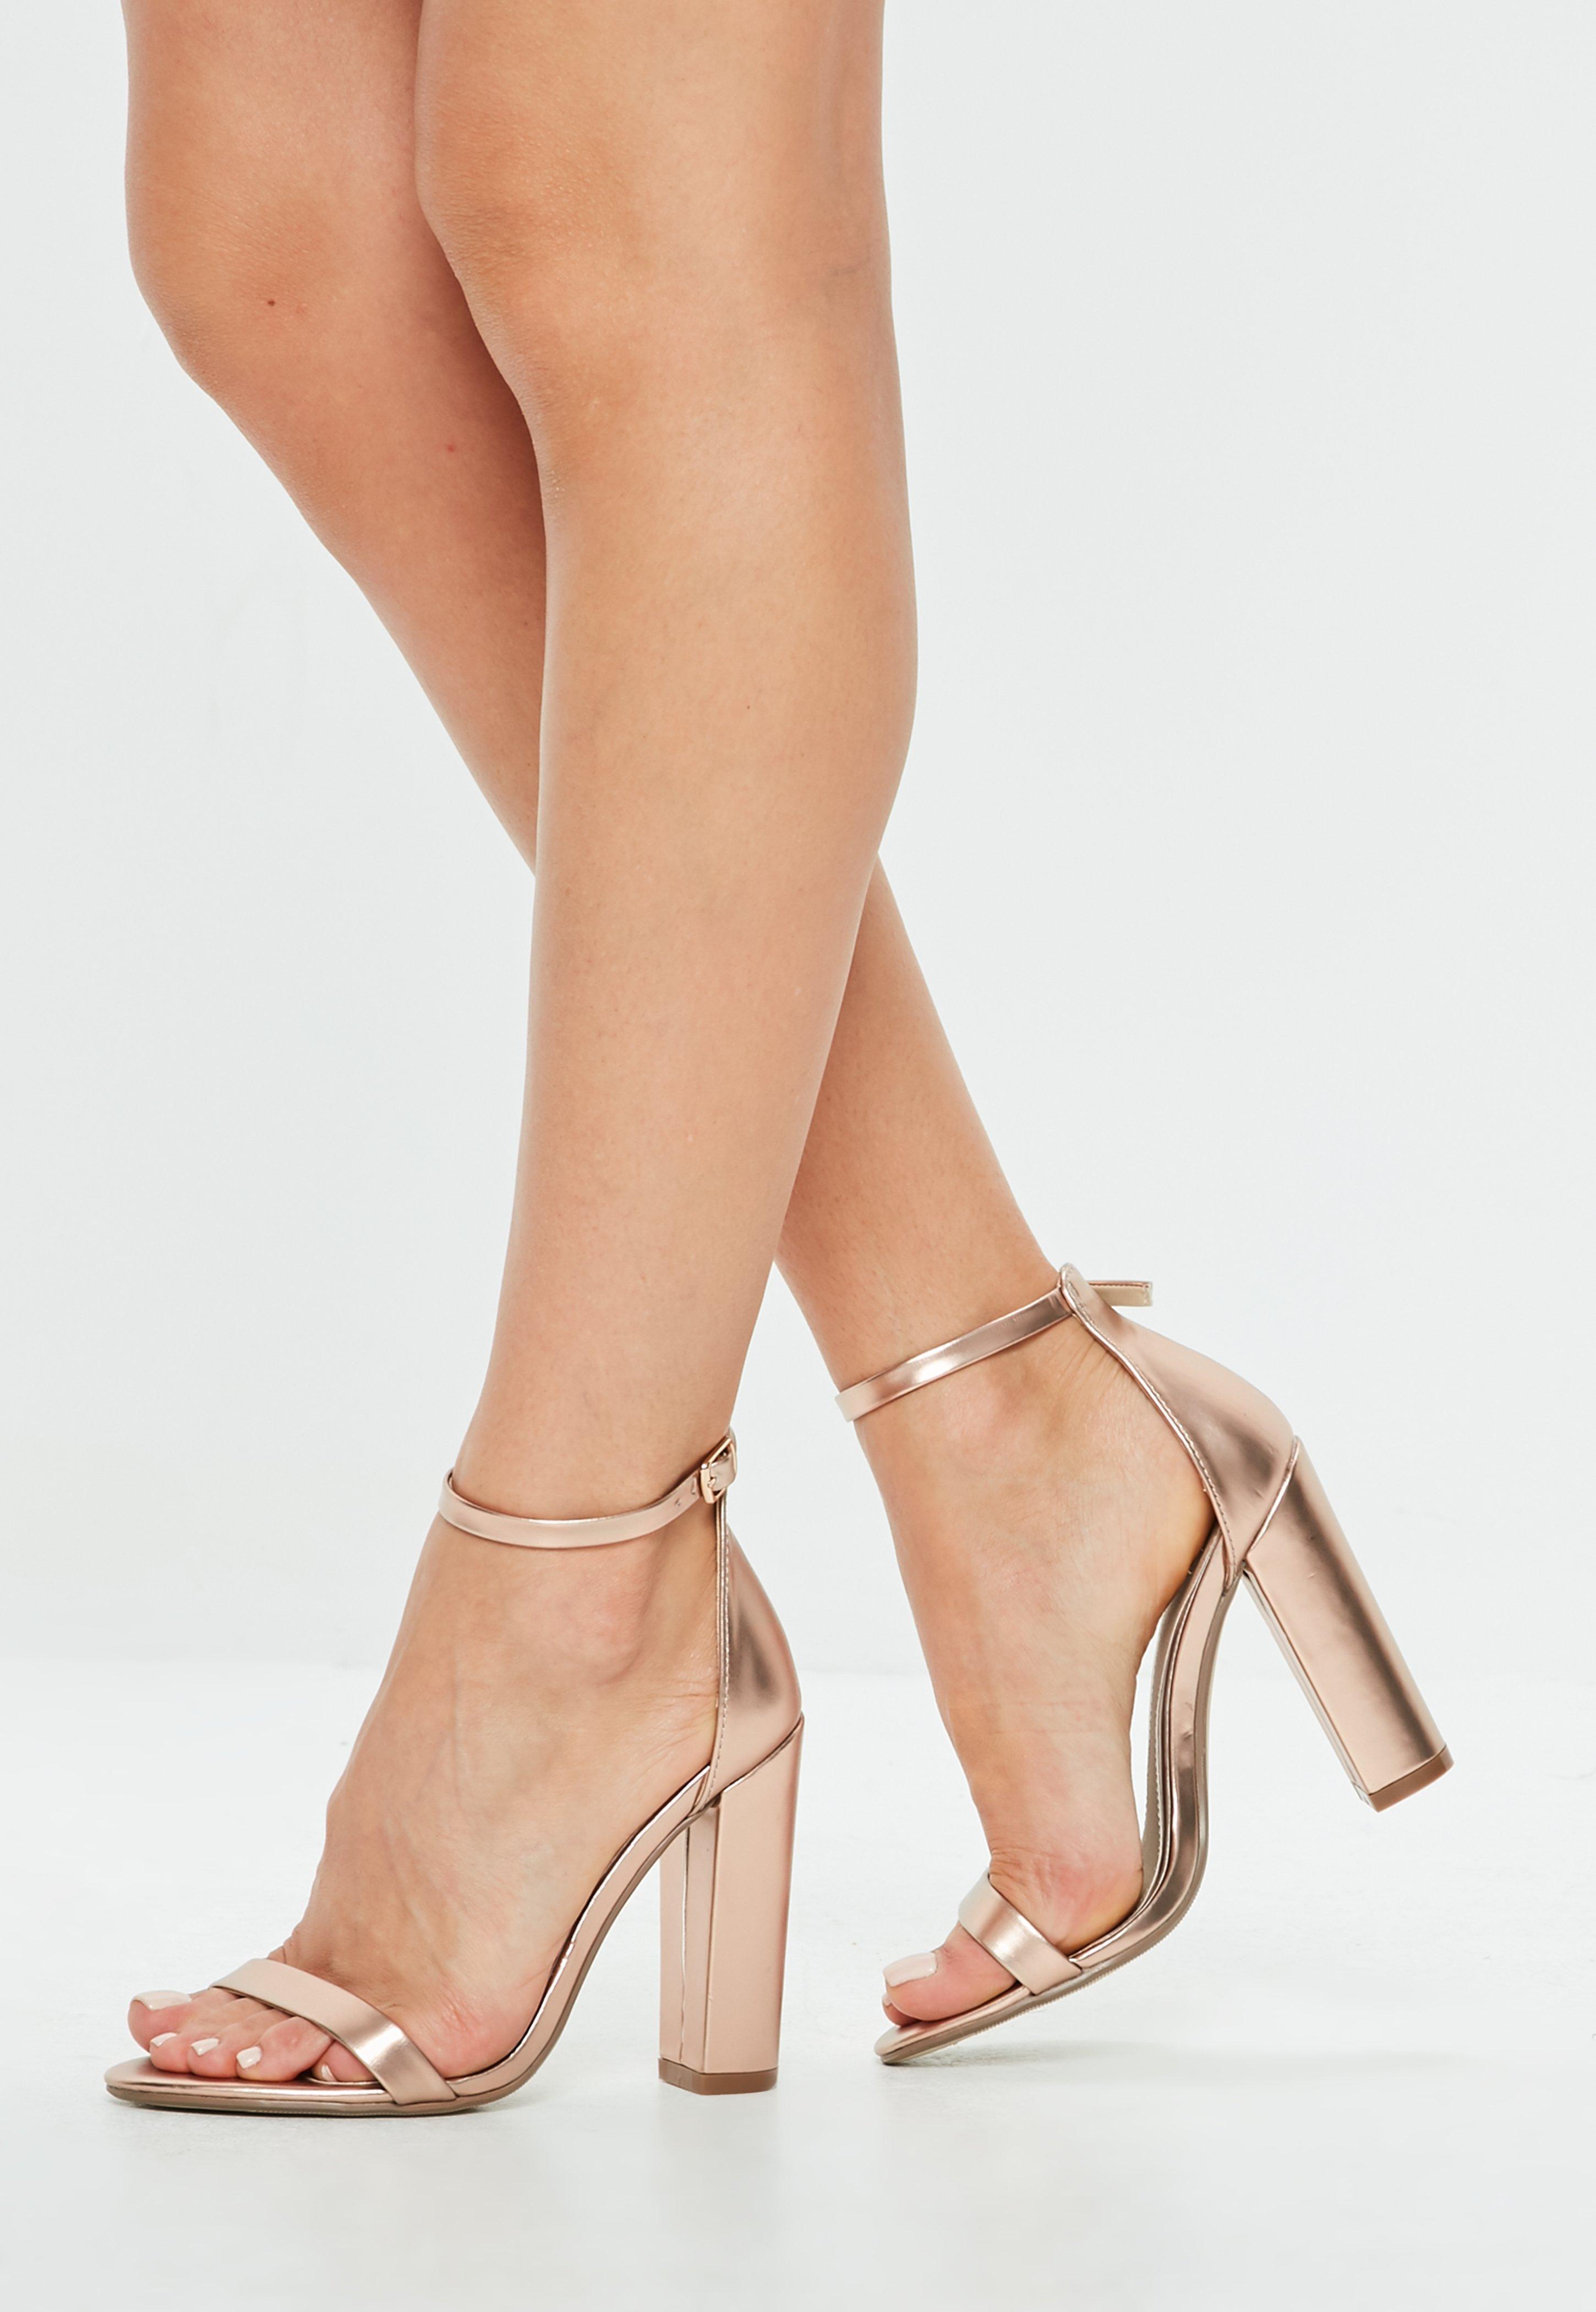 872b4fce4bc Missguided Rose Gold Matt Block Heel Sandals in Pink - Lyst